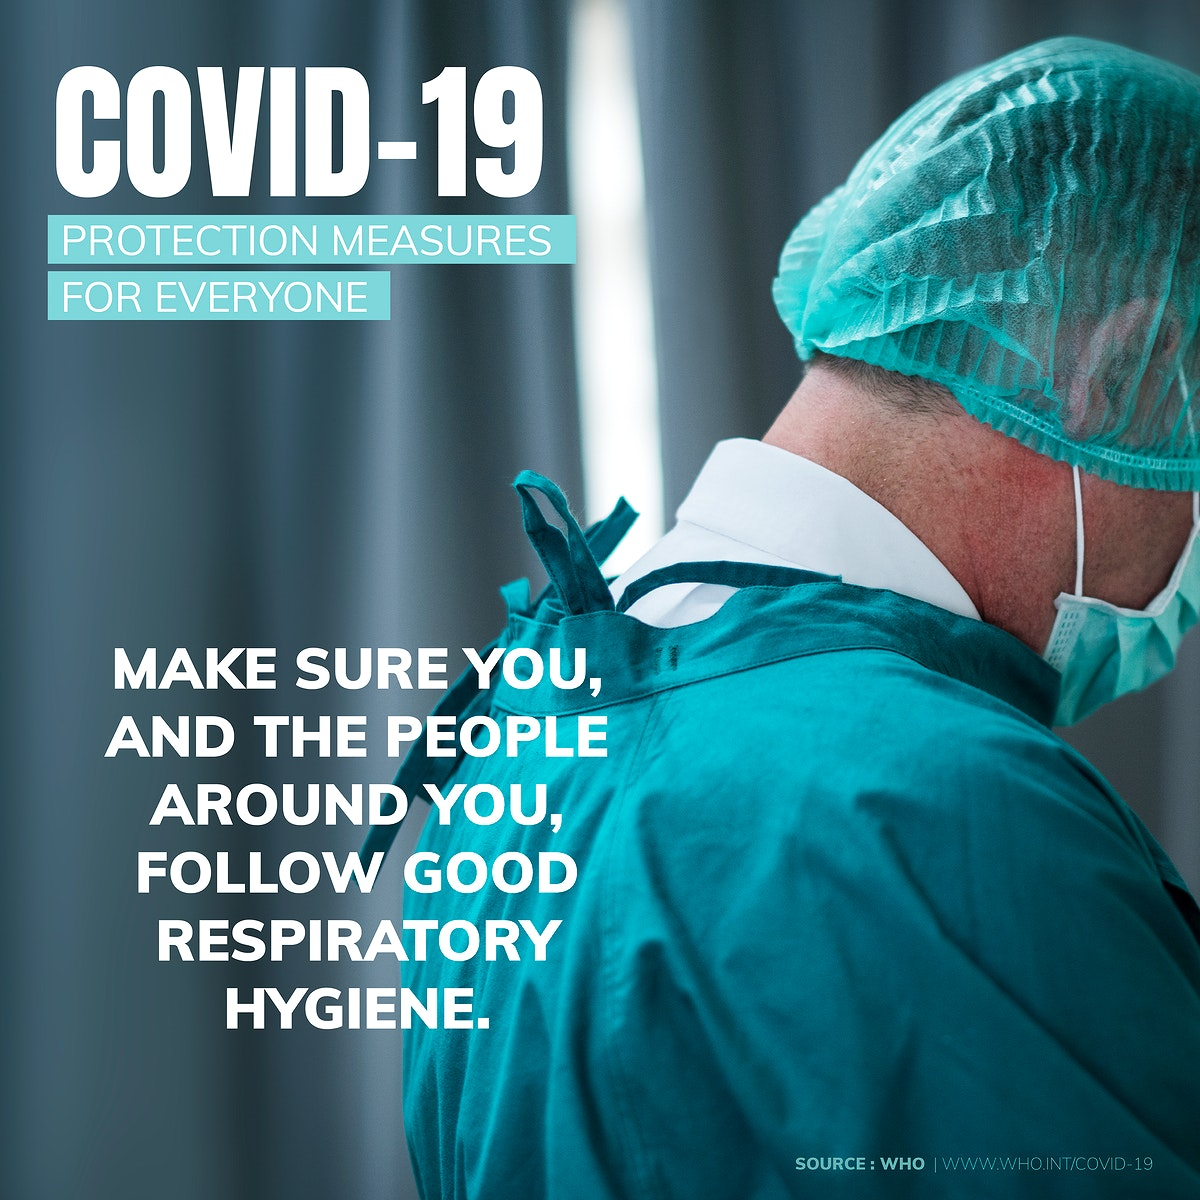 Follow good respiratory hygiene during the coronavirus outbreak social template source WHO vector